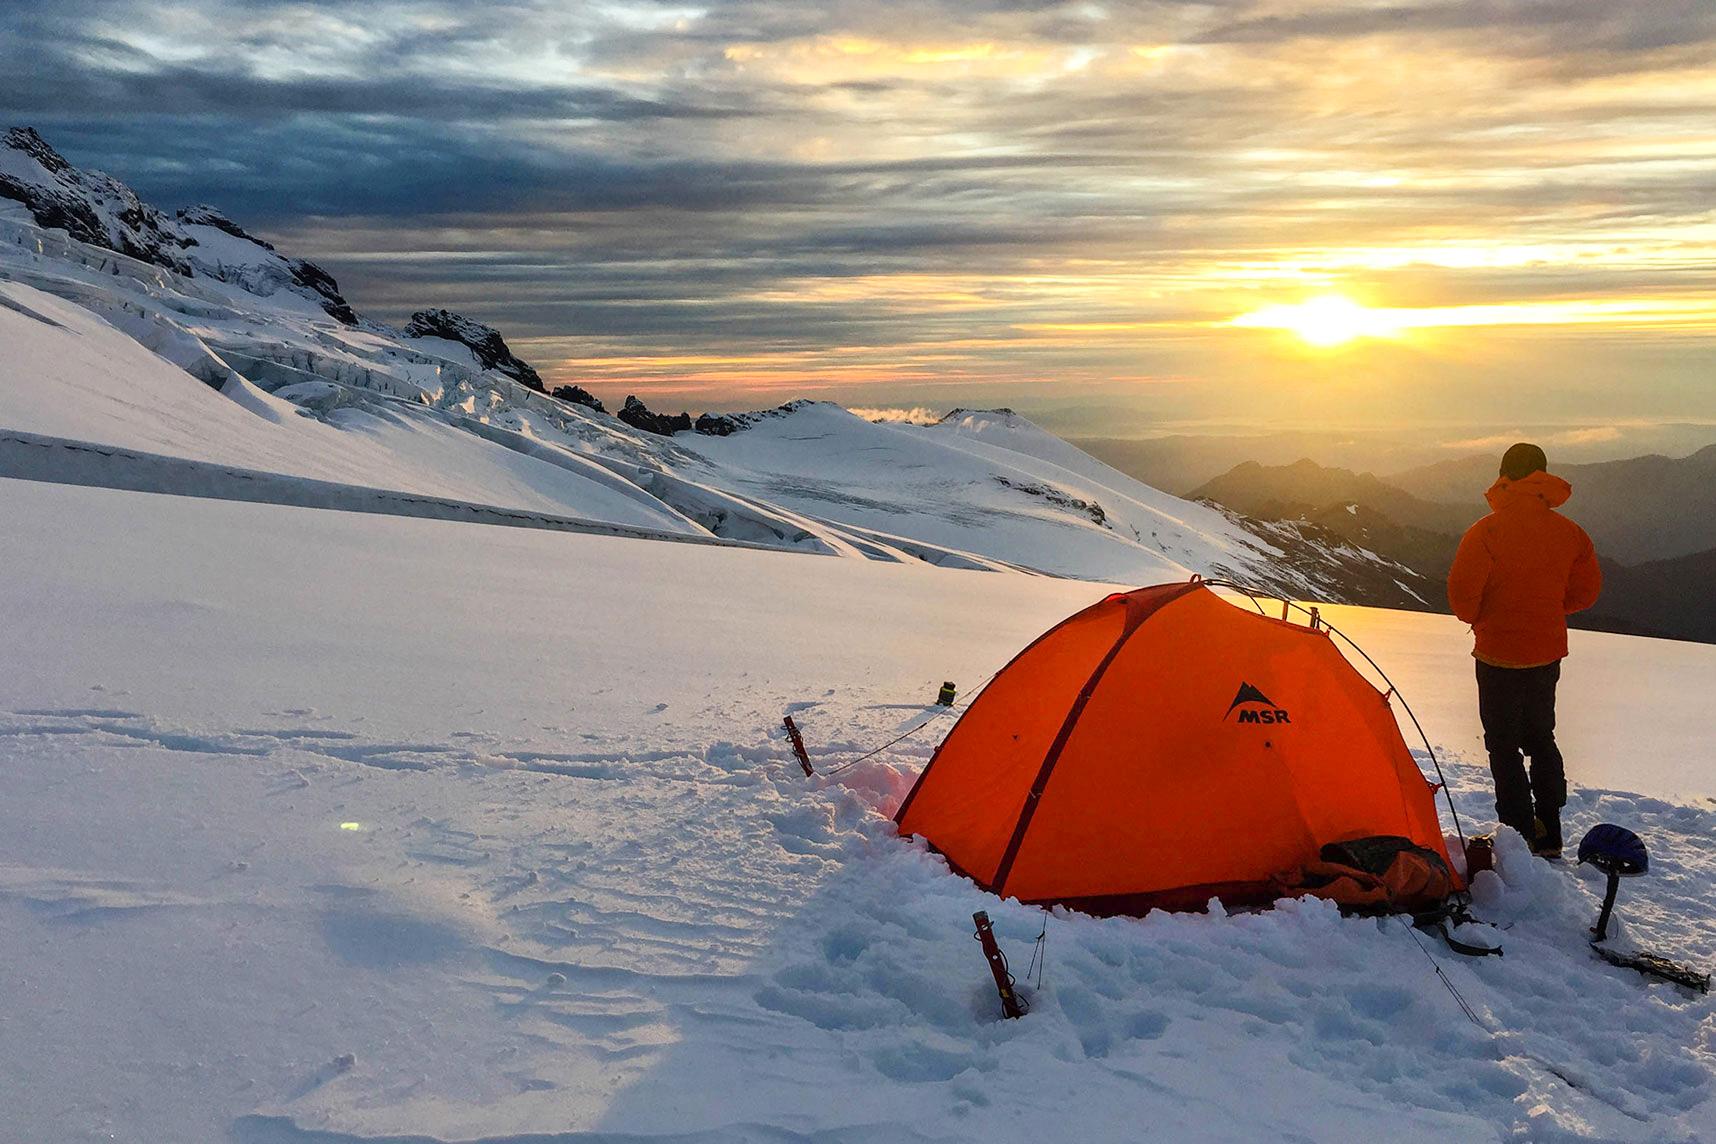 msr advance pro 2 tent review 4-season & Pitch on a Ledge: MSR Advance Pro 4-Season Tent Review